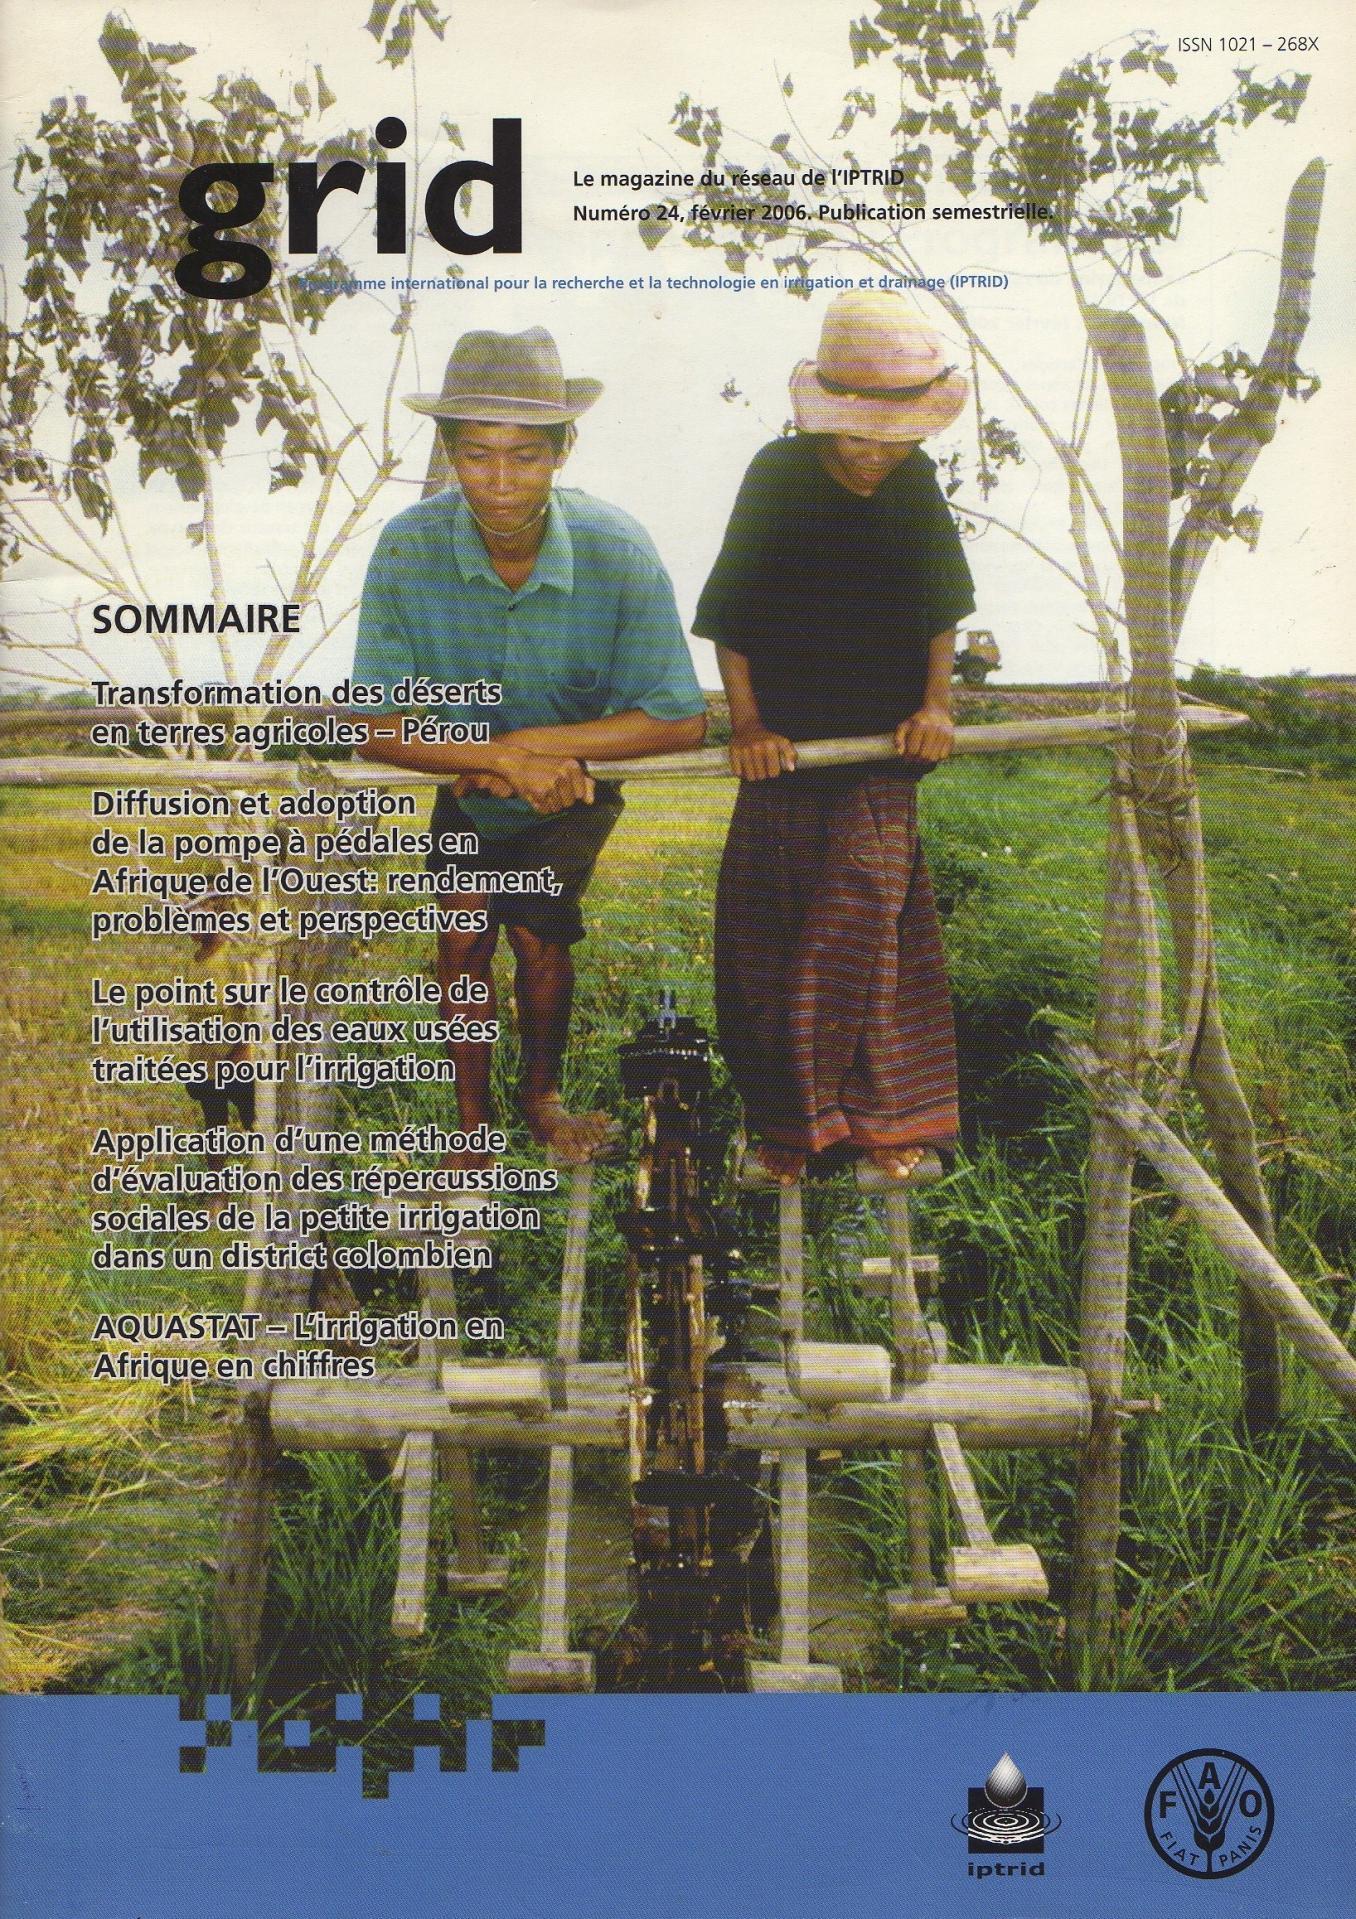 Cambodge moulin a eau bois